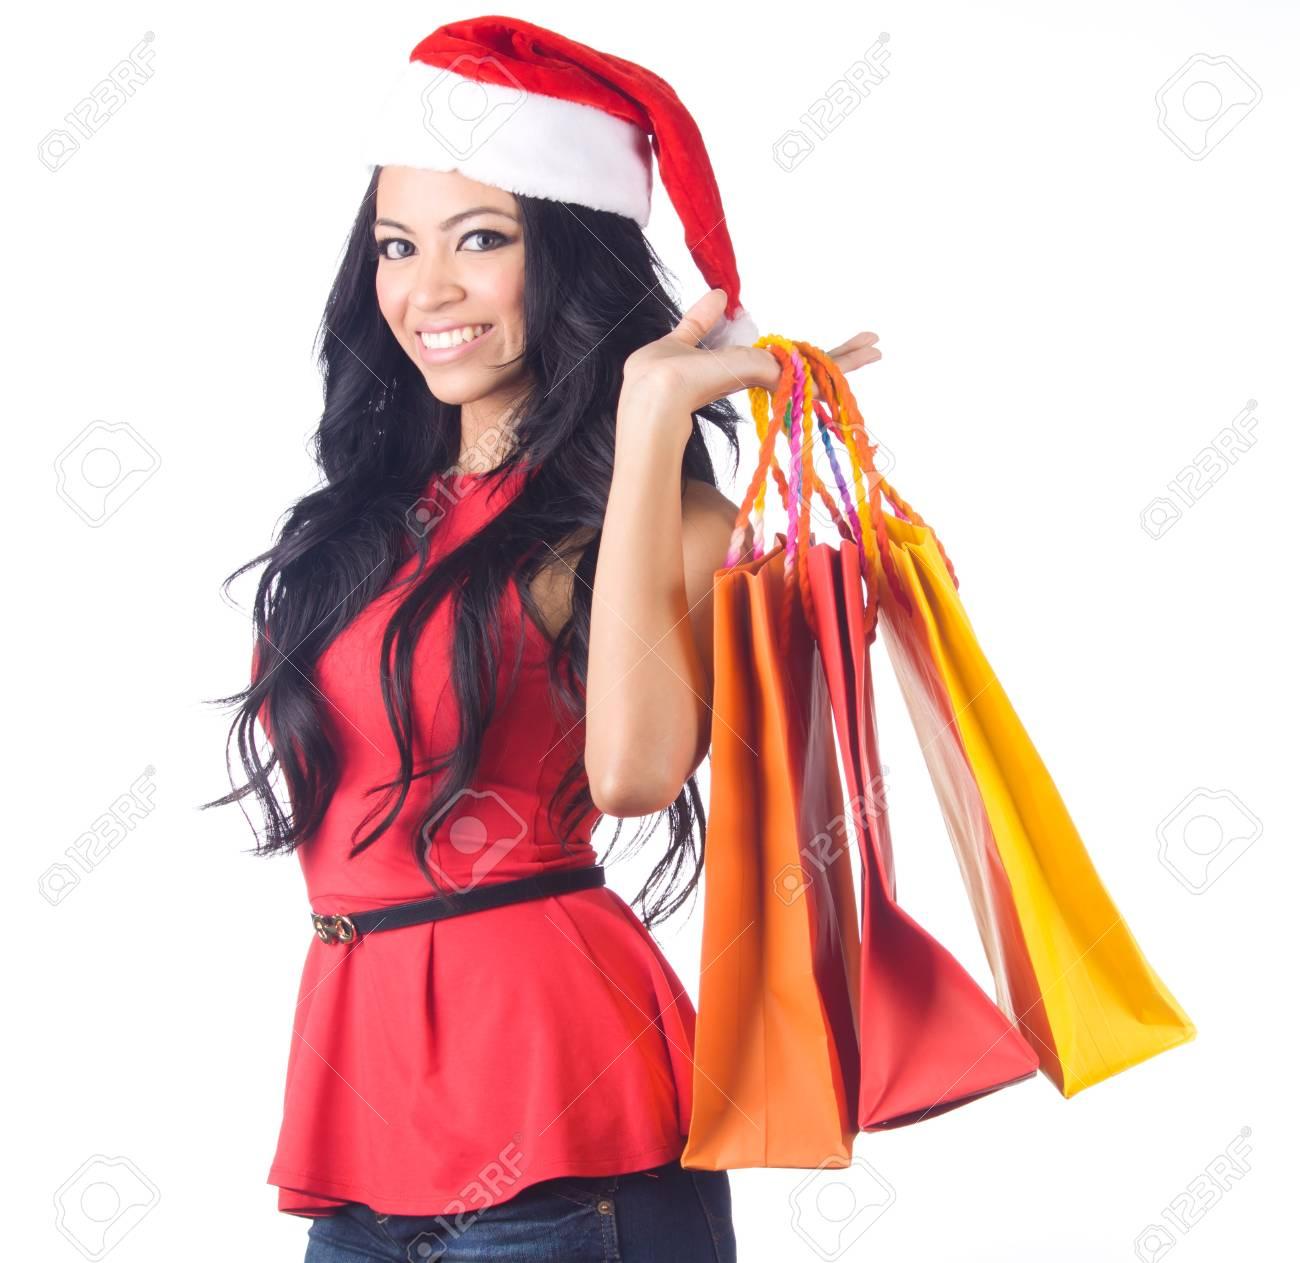 eb489a111a748 Christmas Shopping